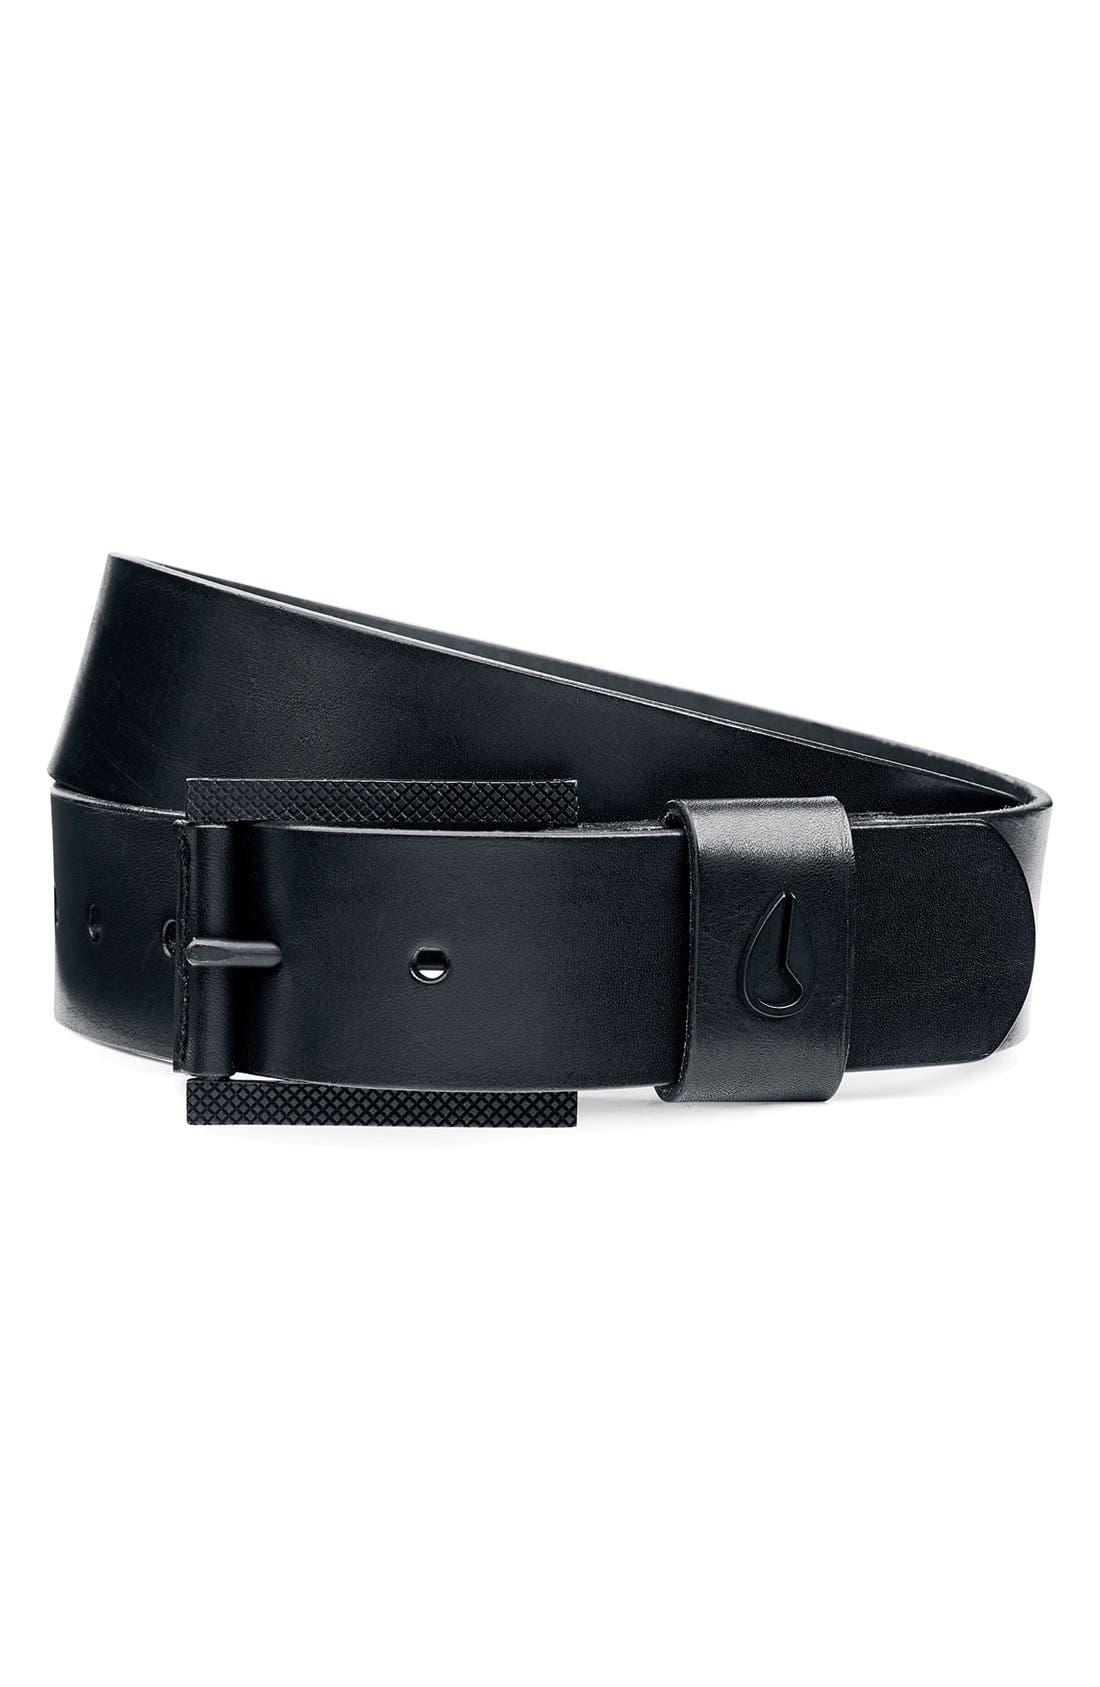 Alternate Image 1 Selected - Nixon 'Americana' Leather Belt